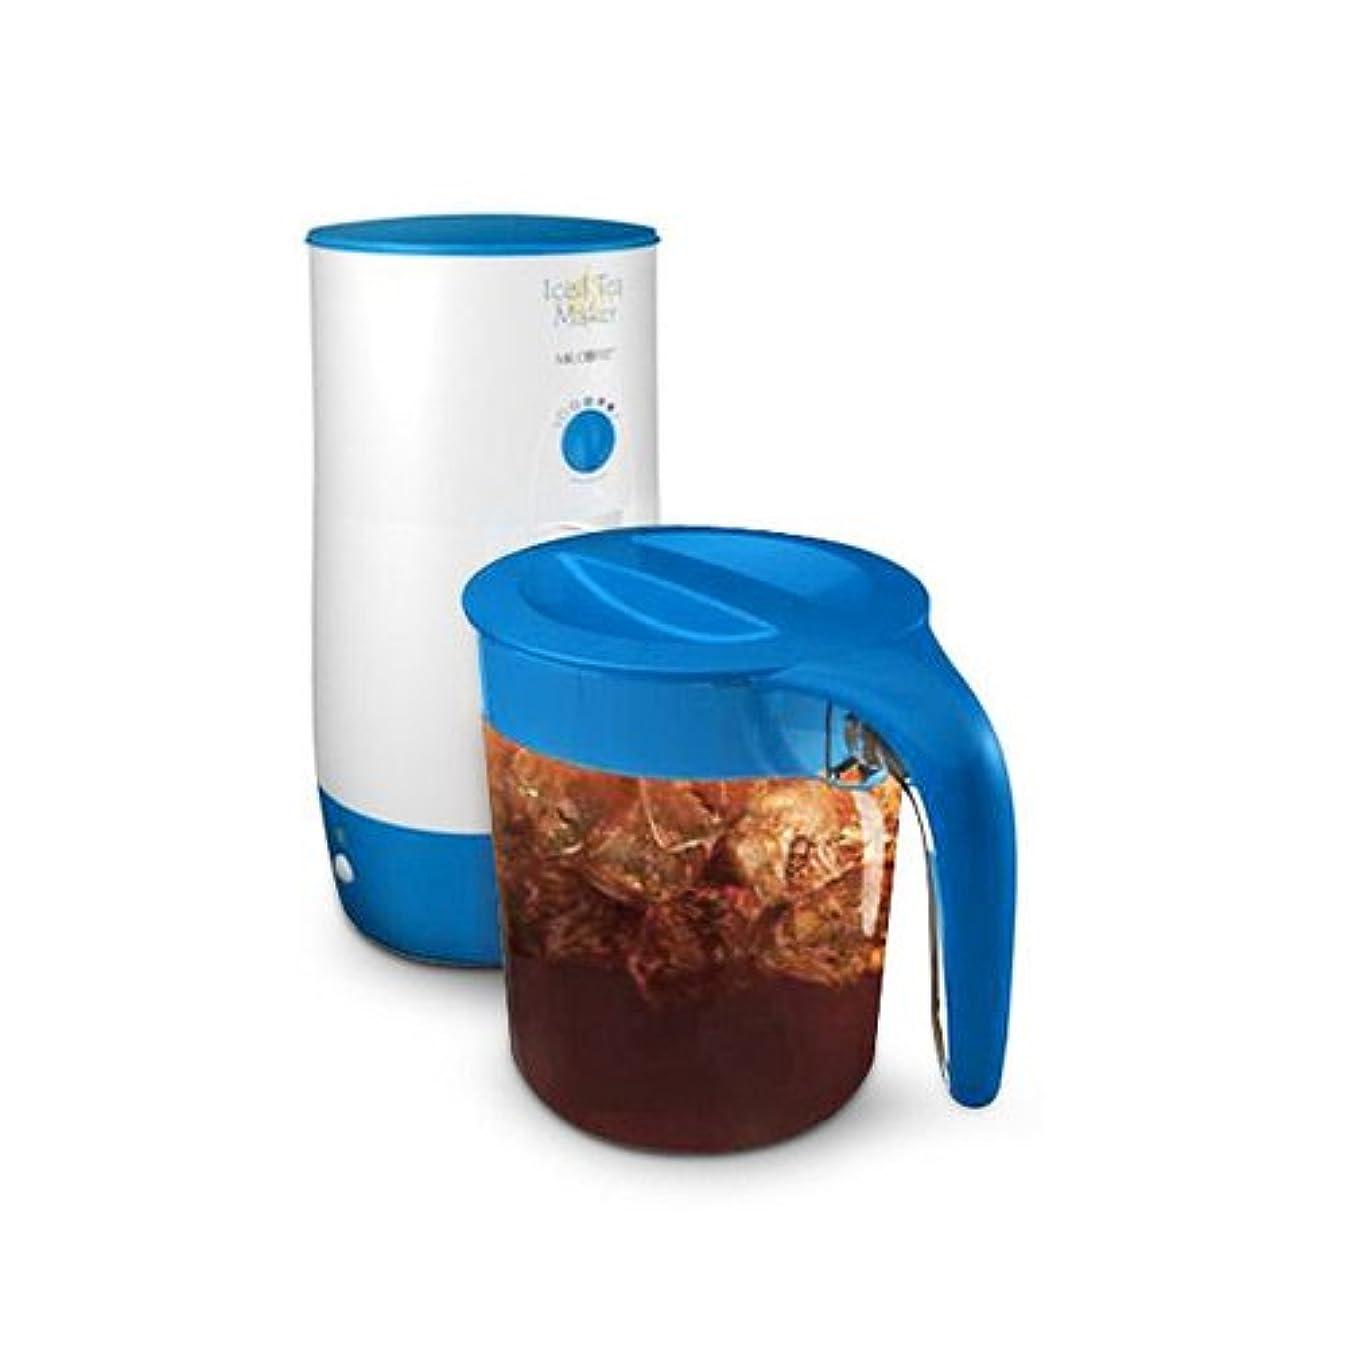 Mr. Coffee TM39P 3 Quart Iced Tea Maker with Pitcher White/Blue